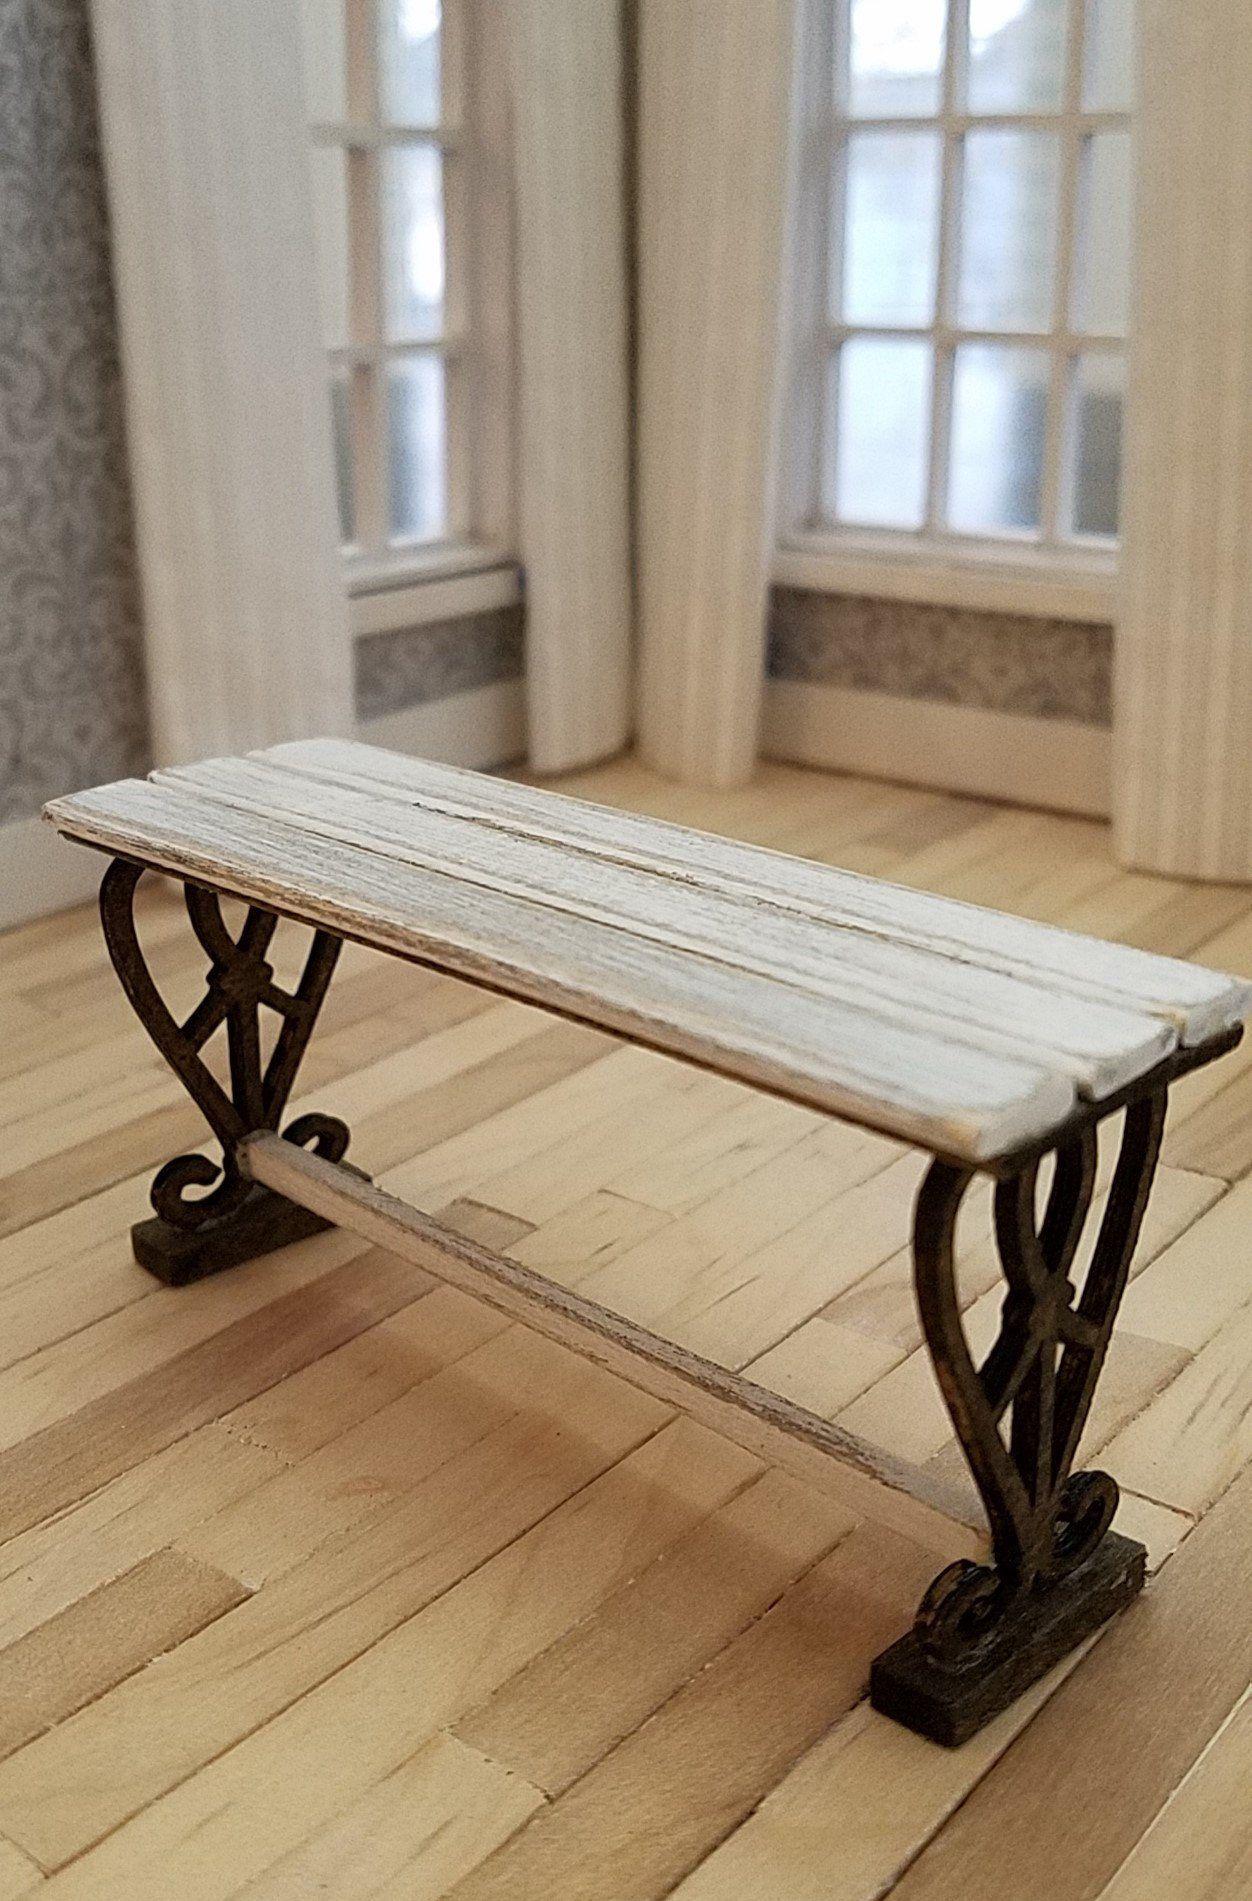 1:12 Dollhouse Furniture Mini Wooden Bench /& Street Lamp Garden Accessories